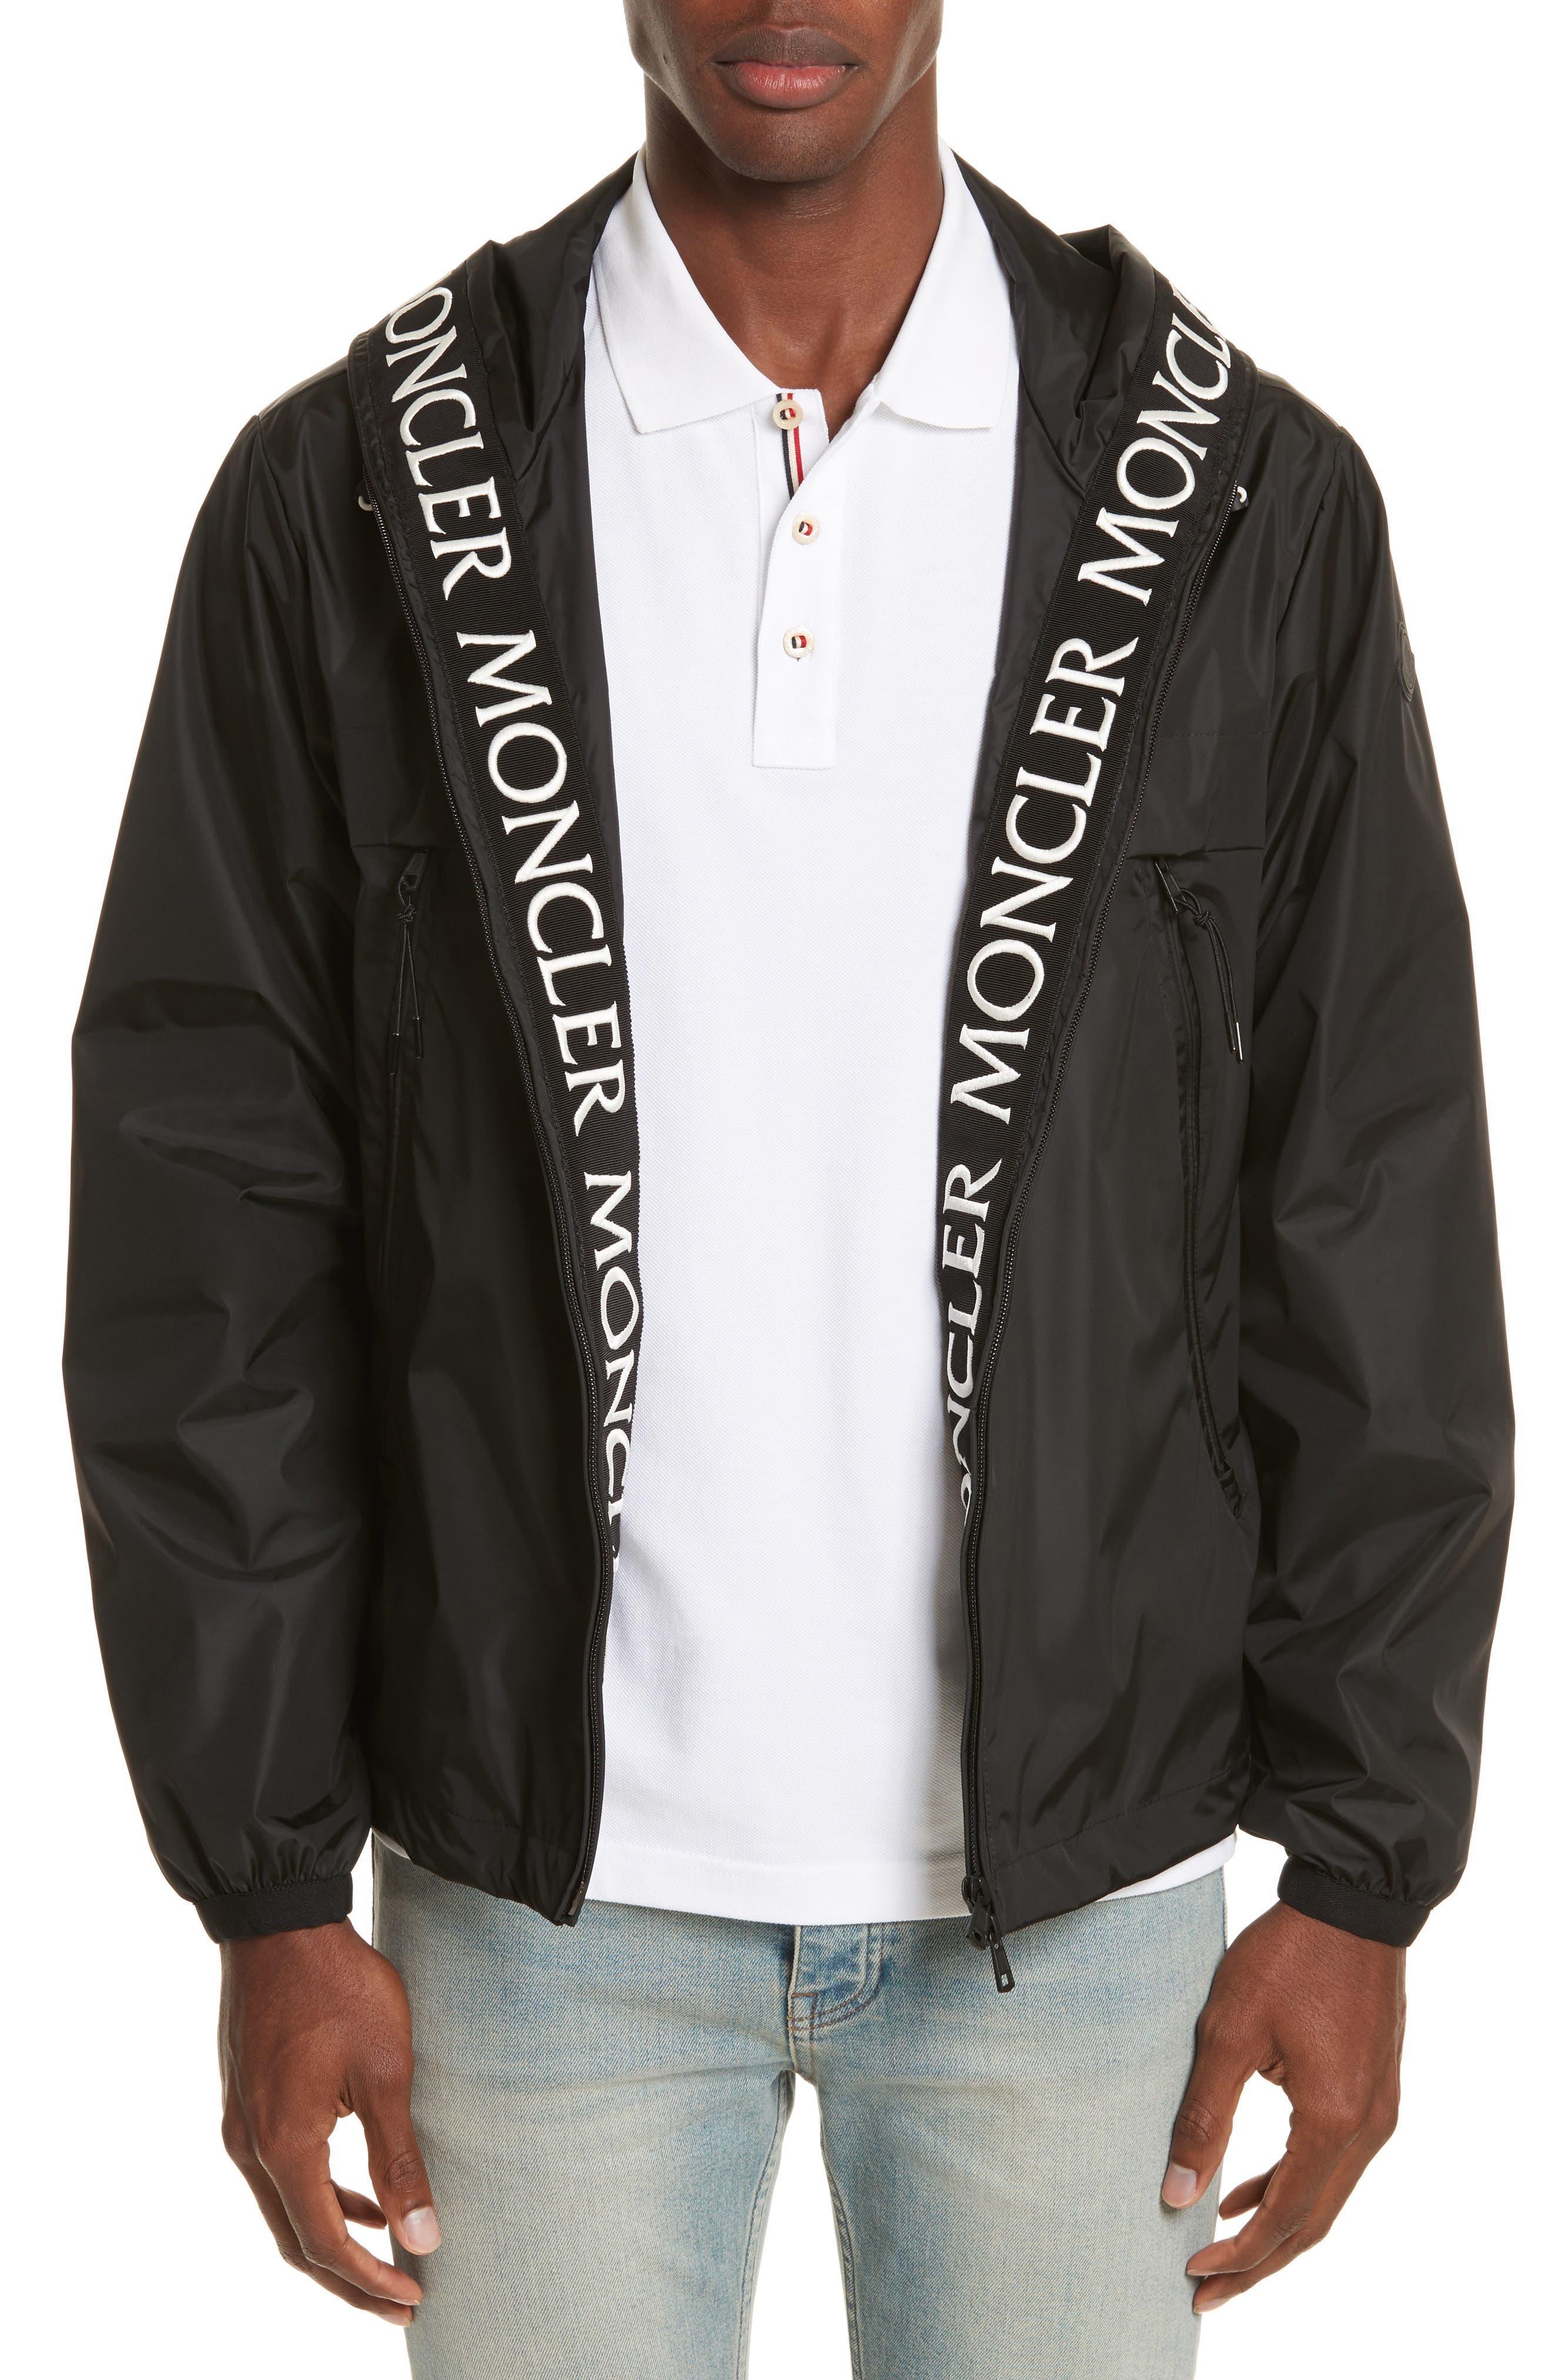 Massereau Zip Jacket,                         Main,                         color, Black